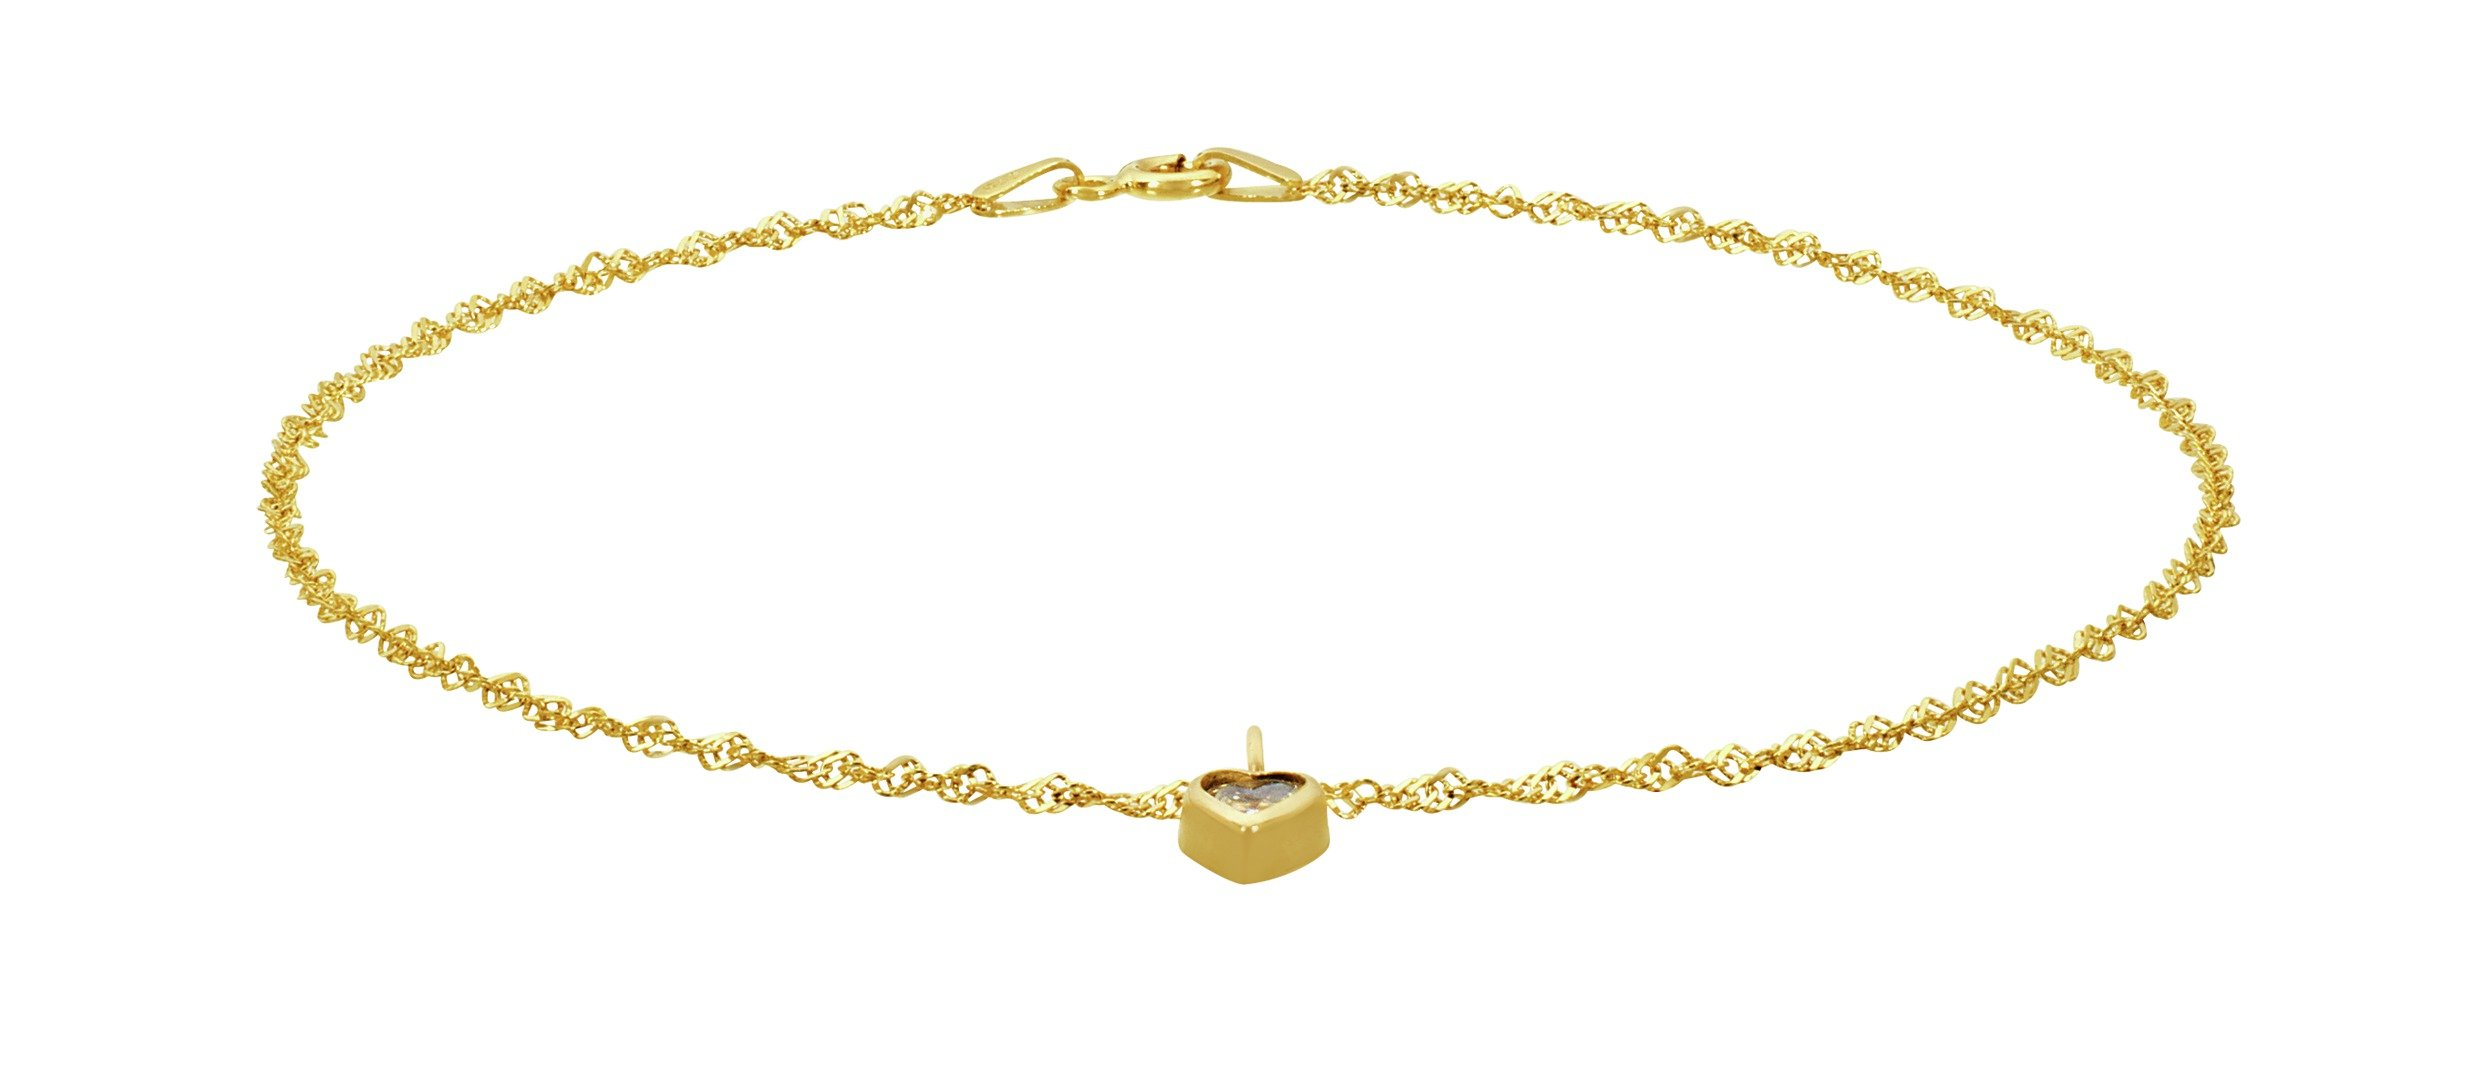 9 Carat Gold review